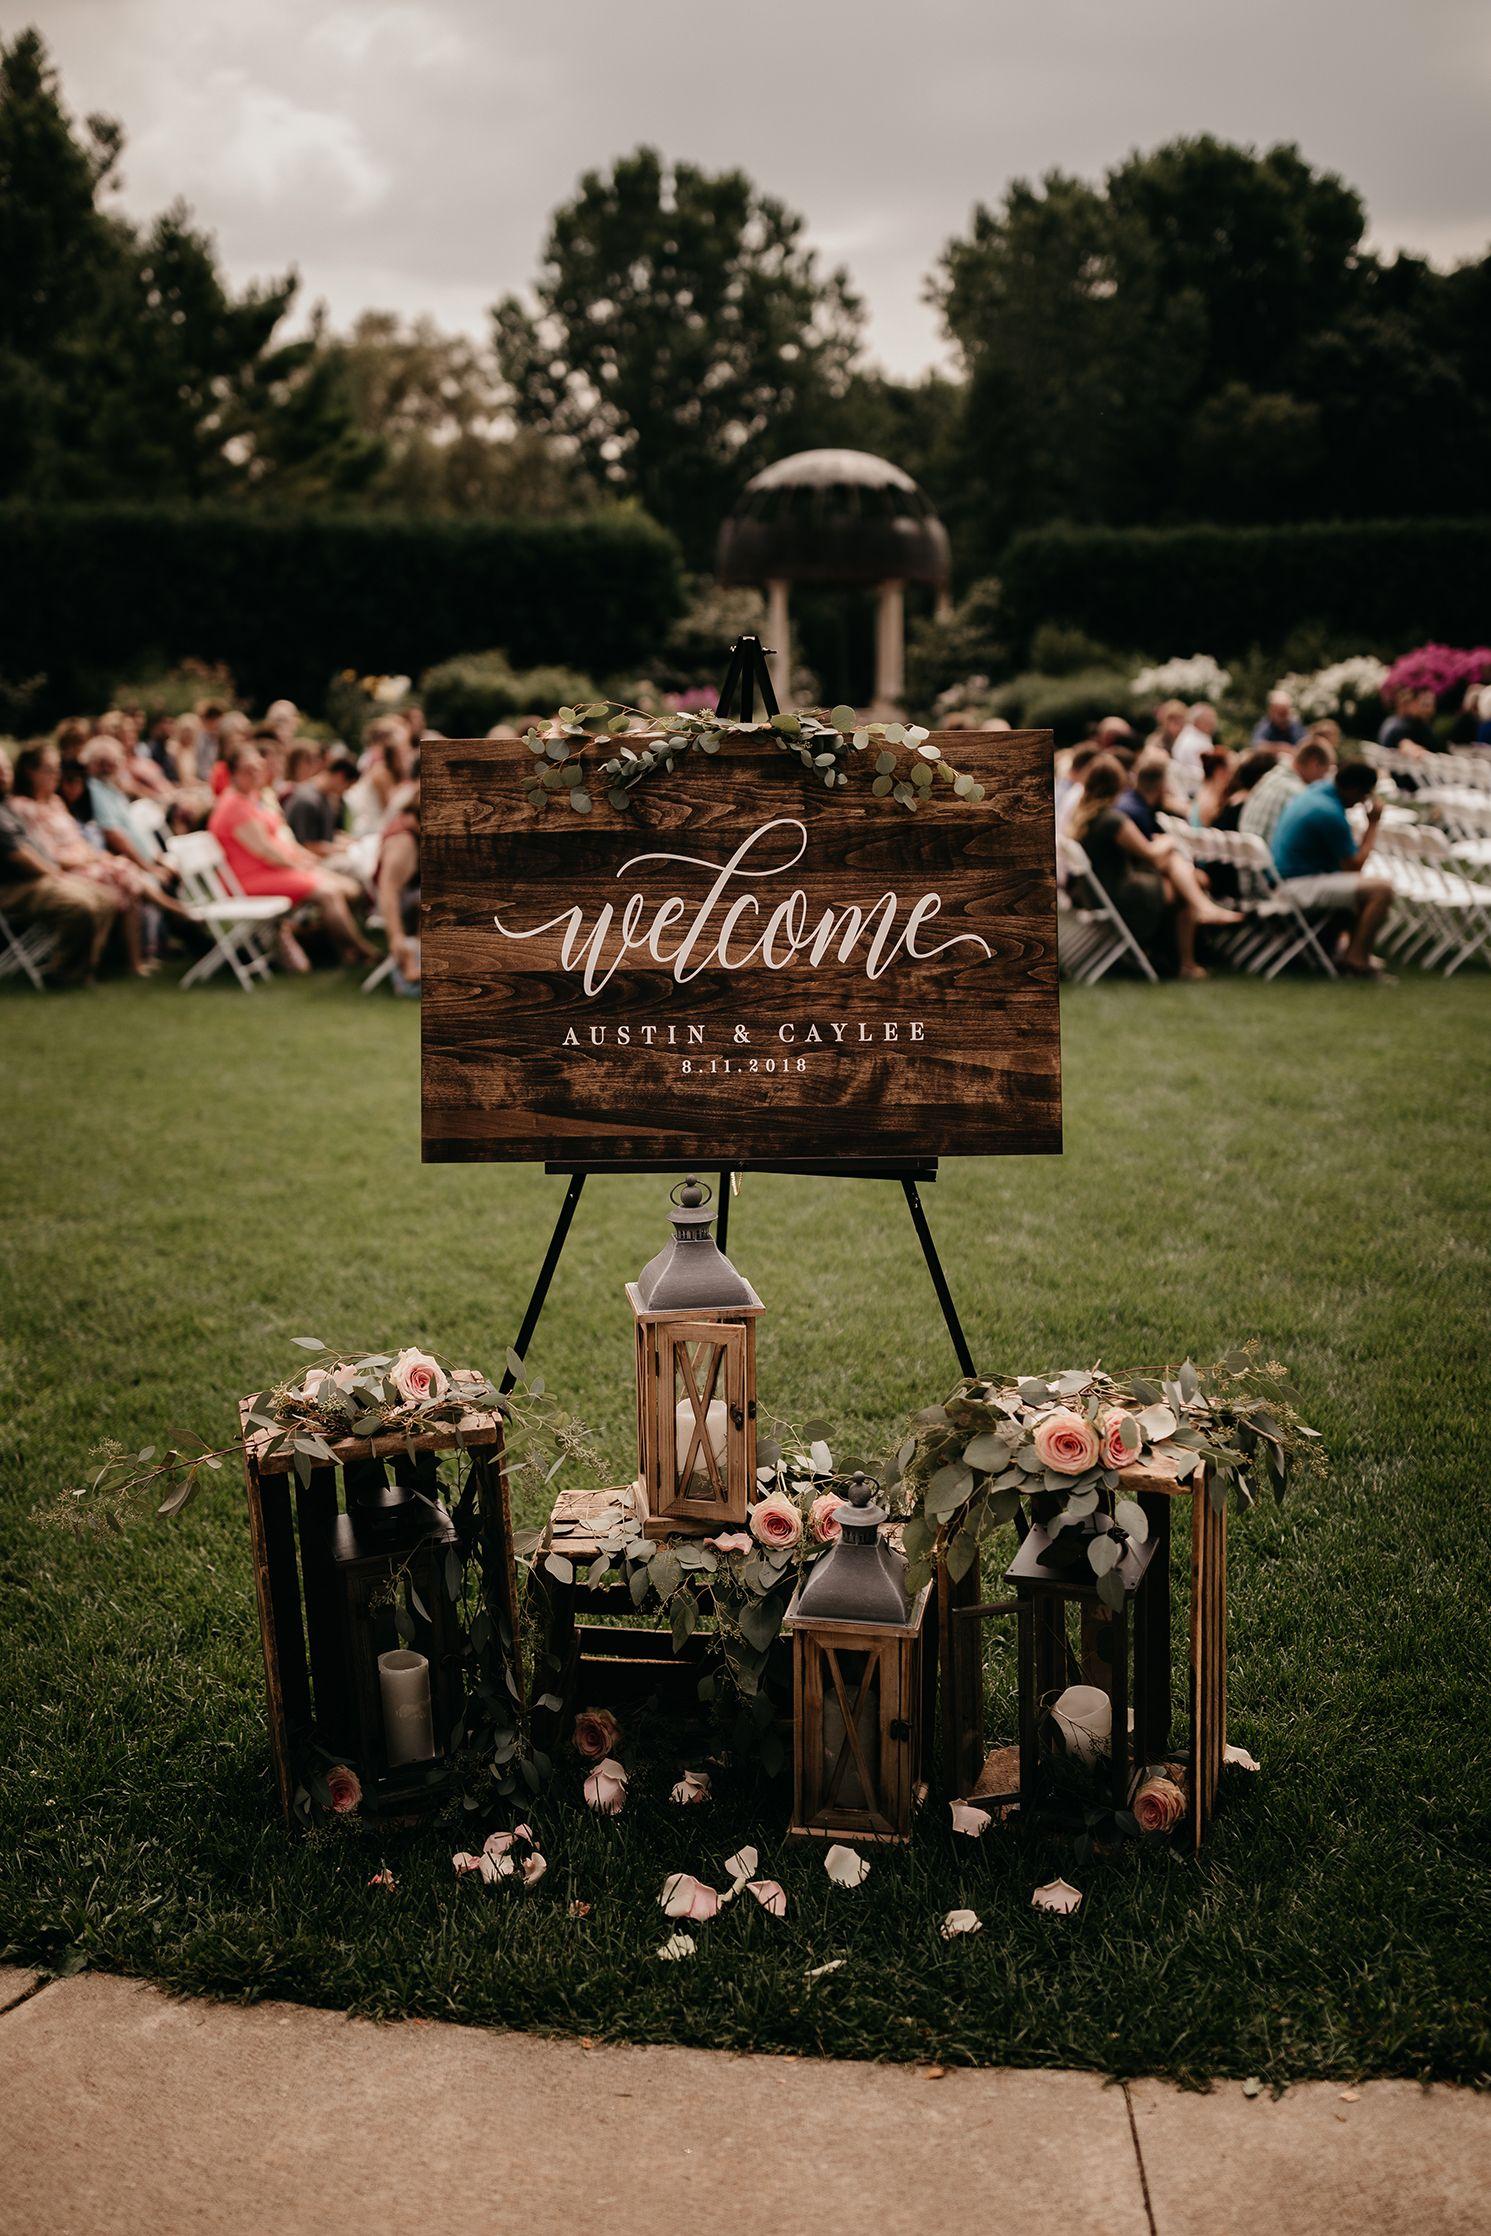 WOOD CALLIGRAPHY WELCOME SIGN ROMANTIC AND MOODY WISCONSIN BOTANICAL GARDEN WEDDING   CAYLEE + AUSTIN via Wedding Planner & Guide #weddingwelcomesign